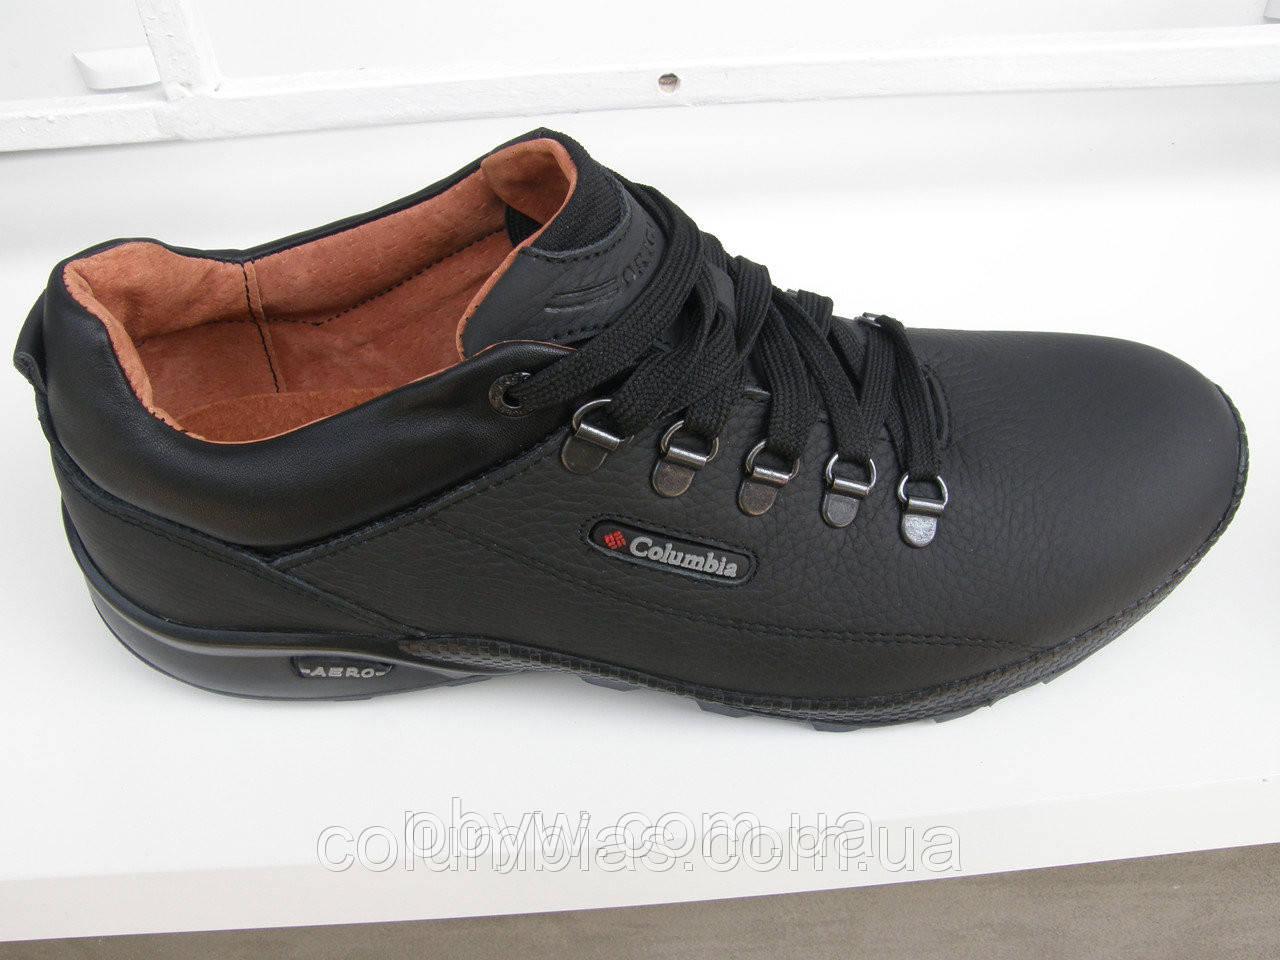 Кожаная обувь Calambia n 67